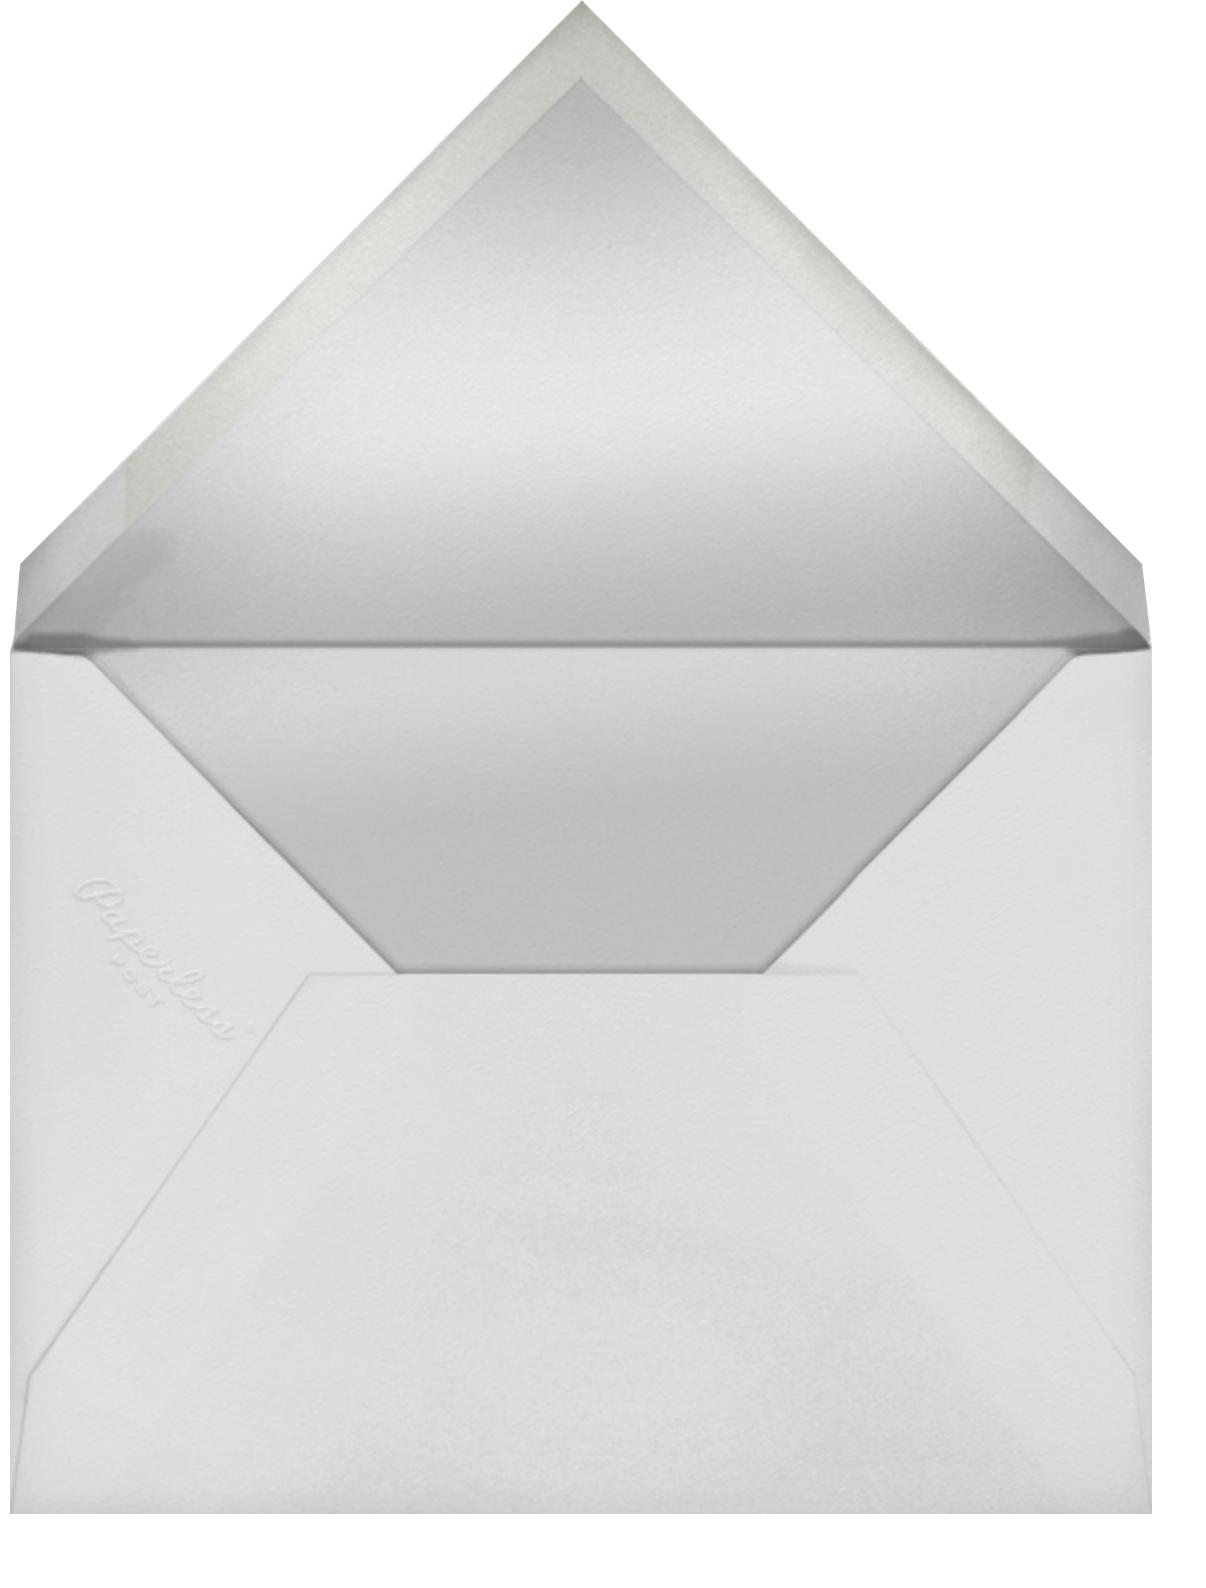 Floral Glade (Menu) - Rifle Paper Co. - Rifle Paper Co. - envelope back